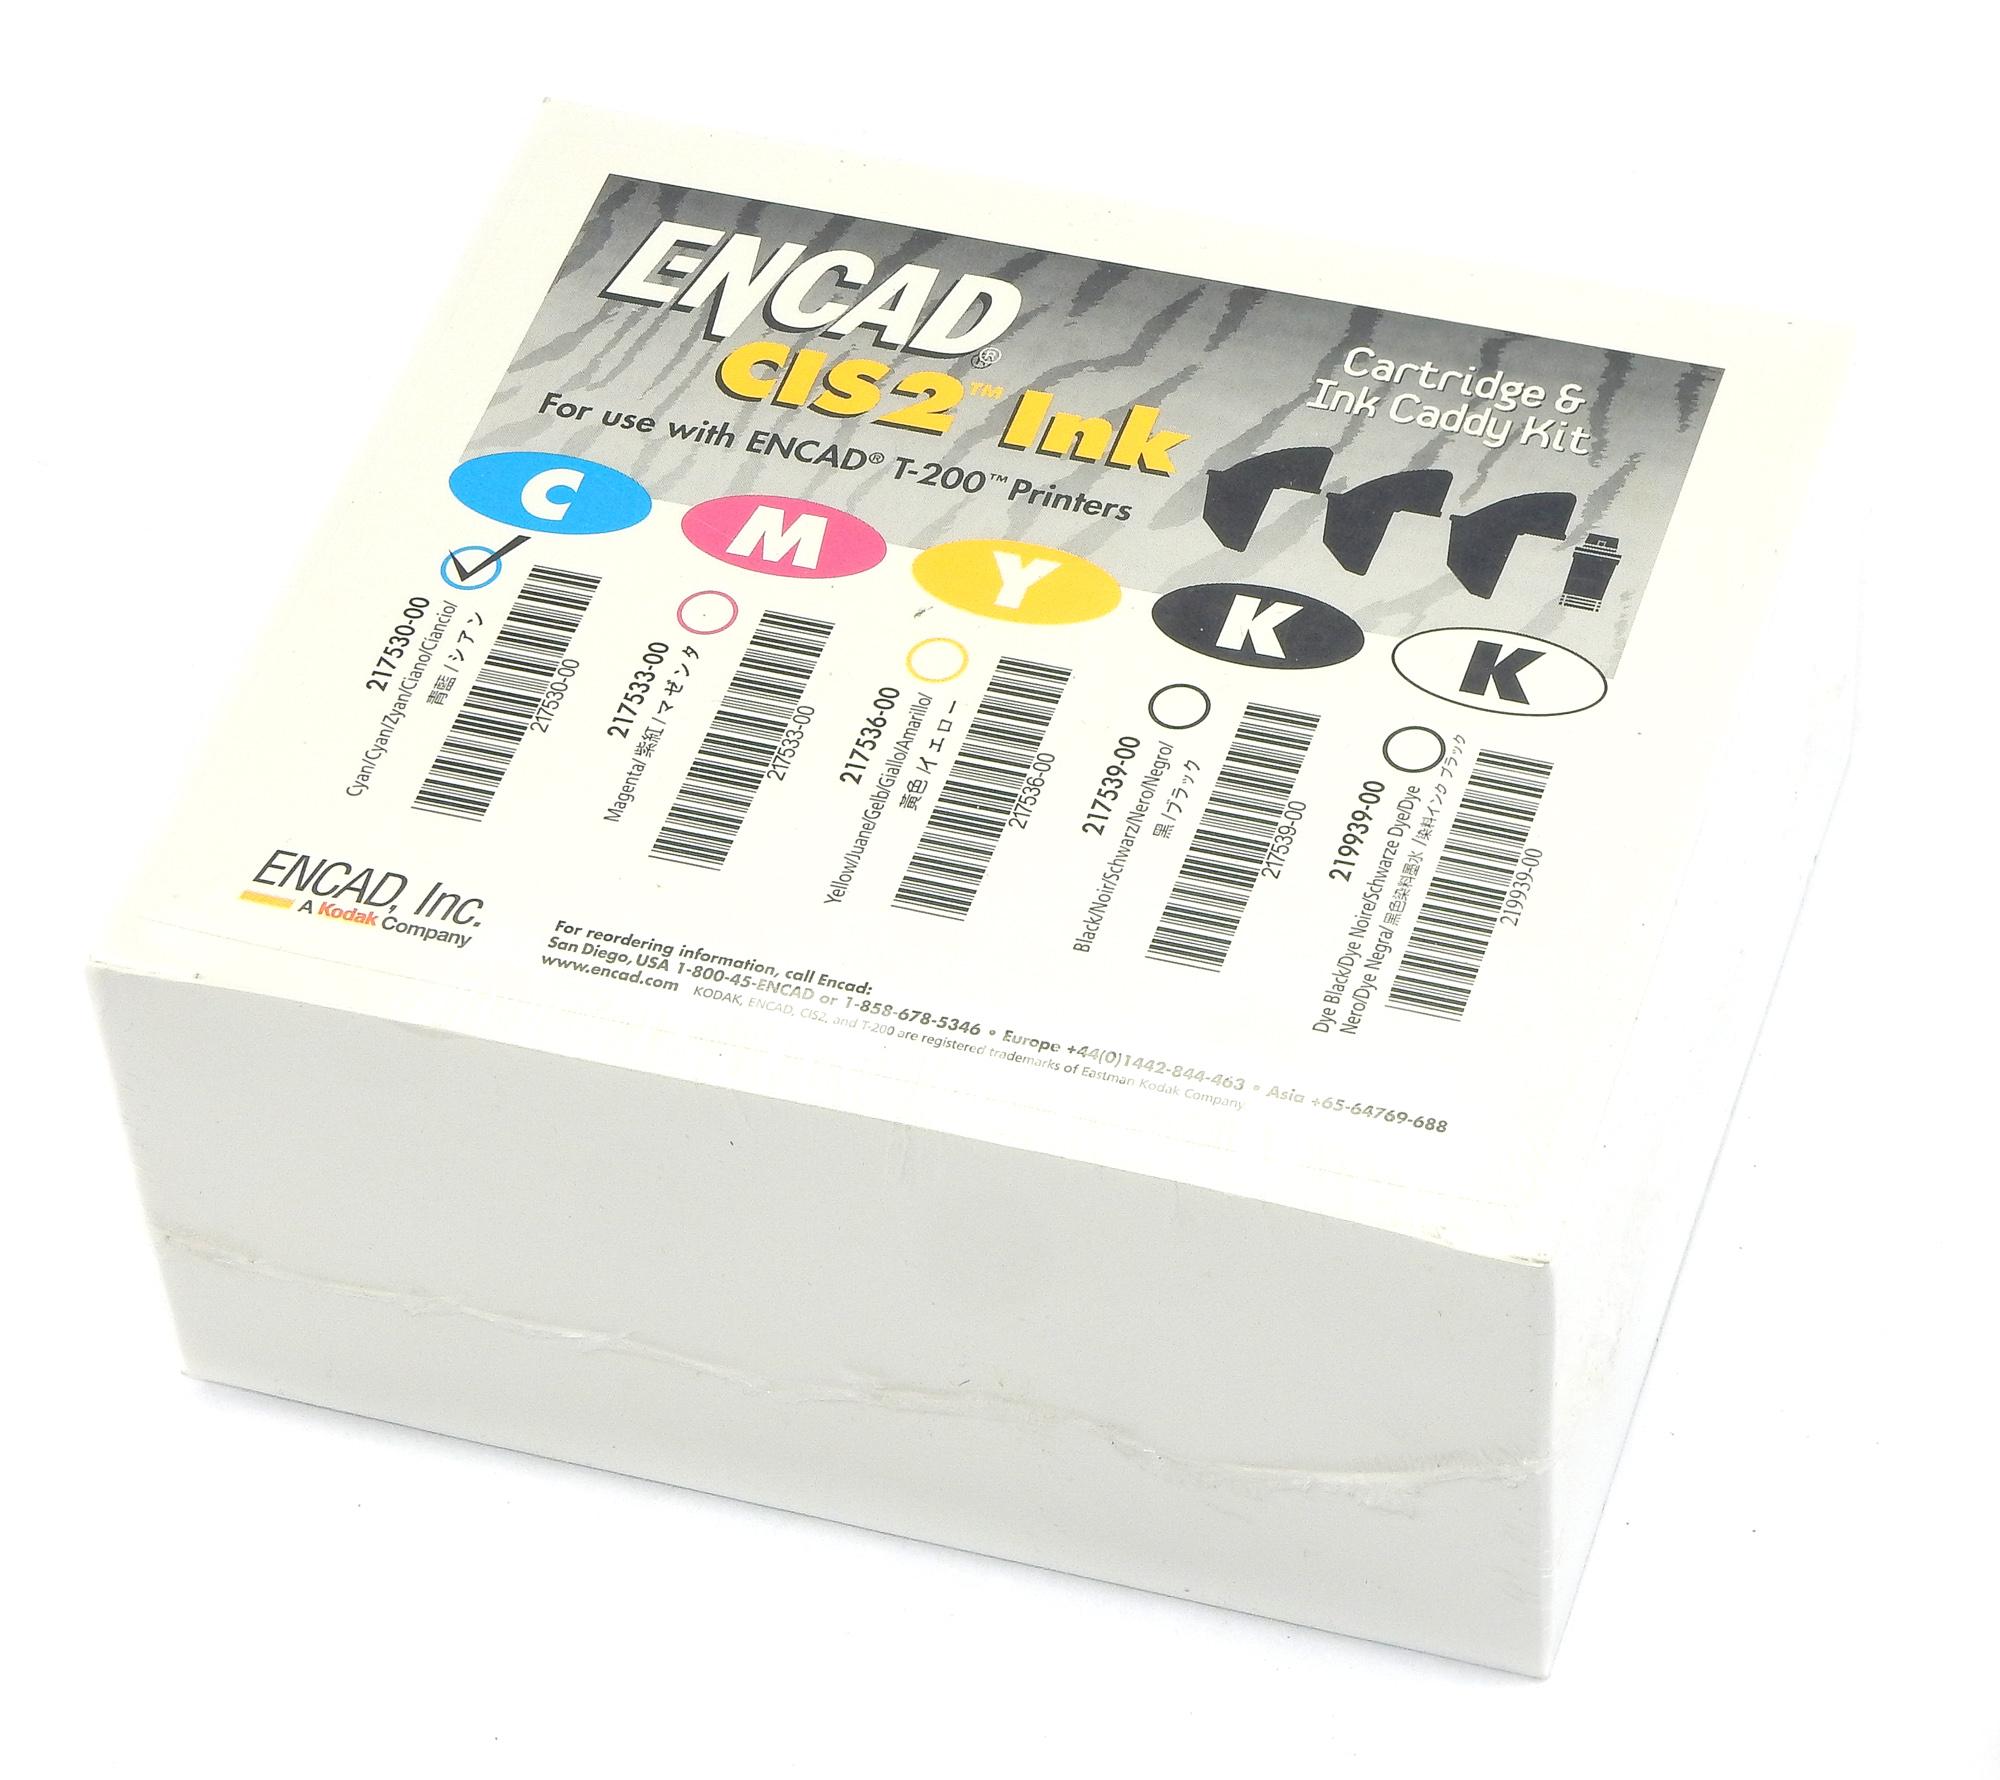 Genuine & New ENCAD 217530-00 CIS2 Cartridge & Ink Caddy Kit - Cyan